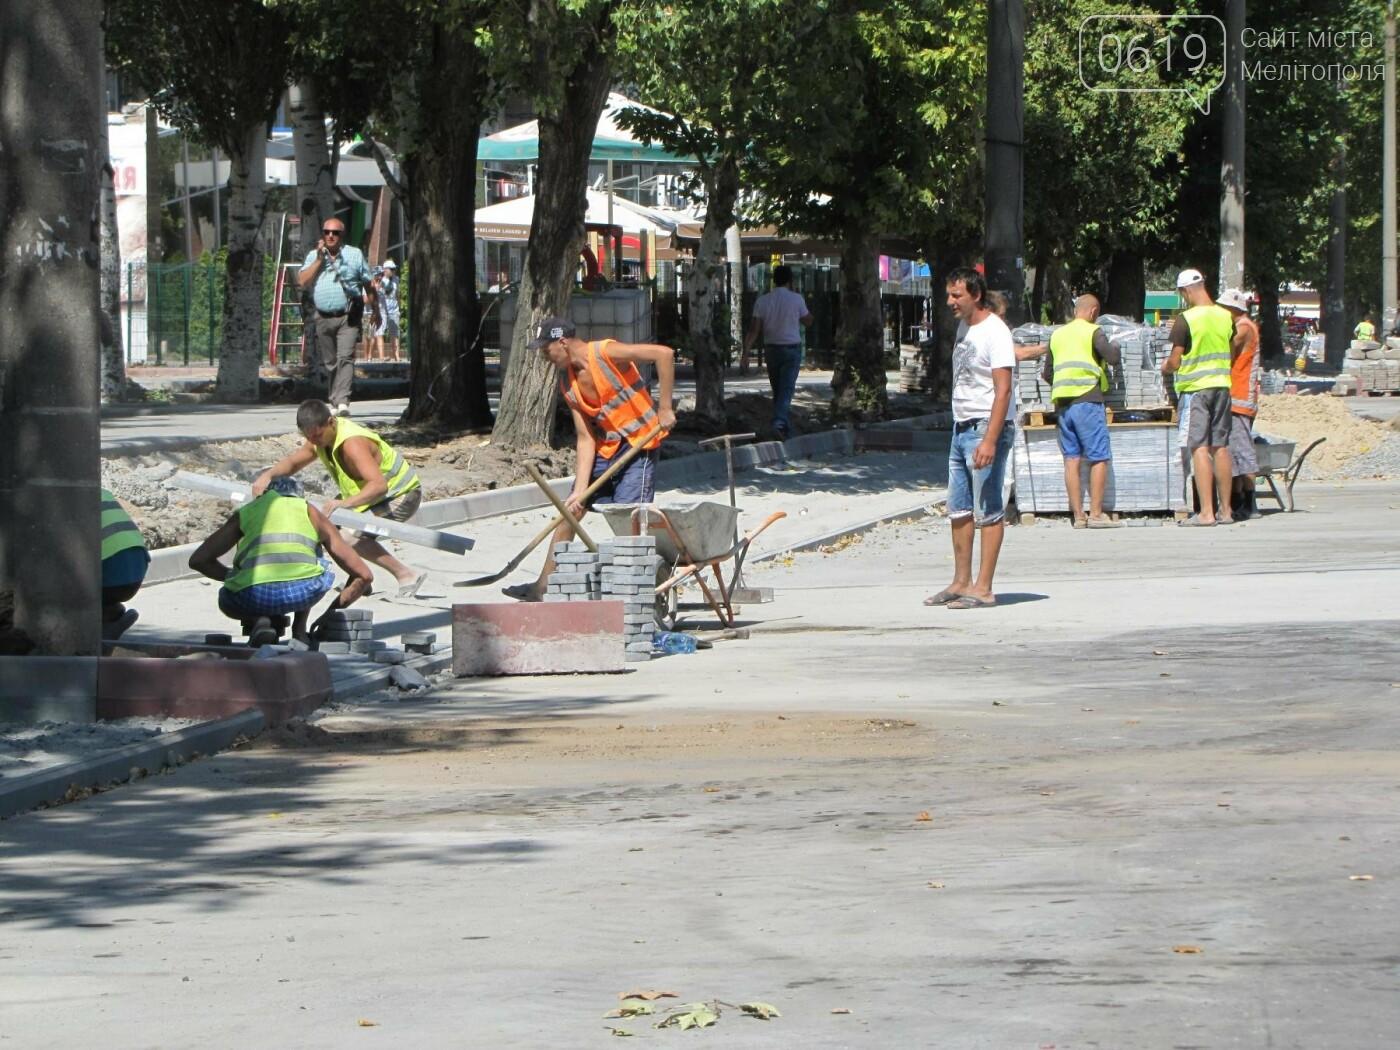 В Мелитополе отремонтируют проспект до Дня города , фото-2